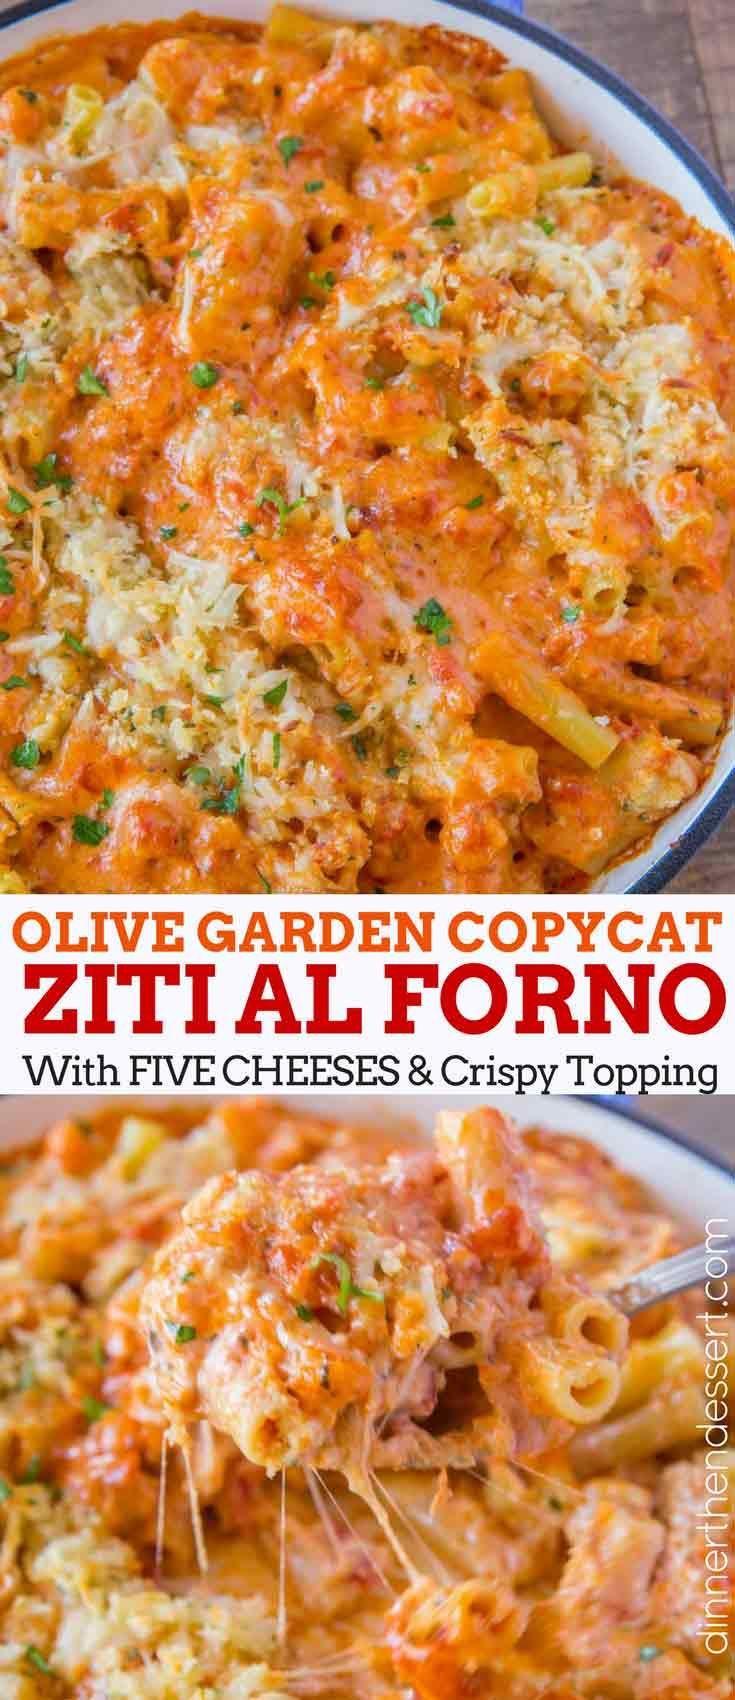 Olive Garden Five Cheese Ziti al Forno copycat recipe made with marinara, alfred... -  Olive Garden